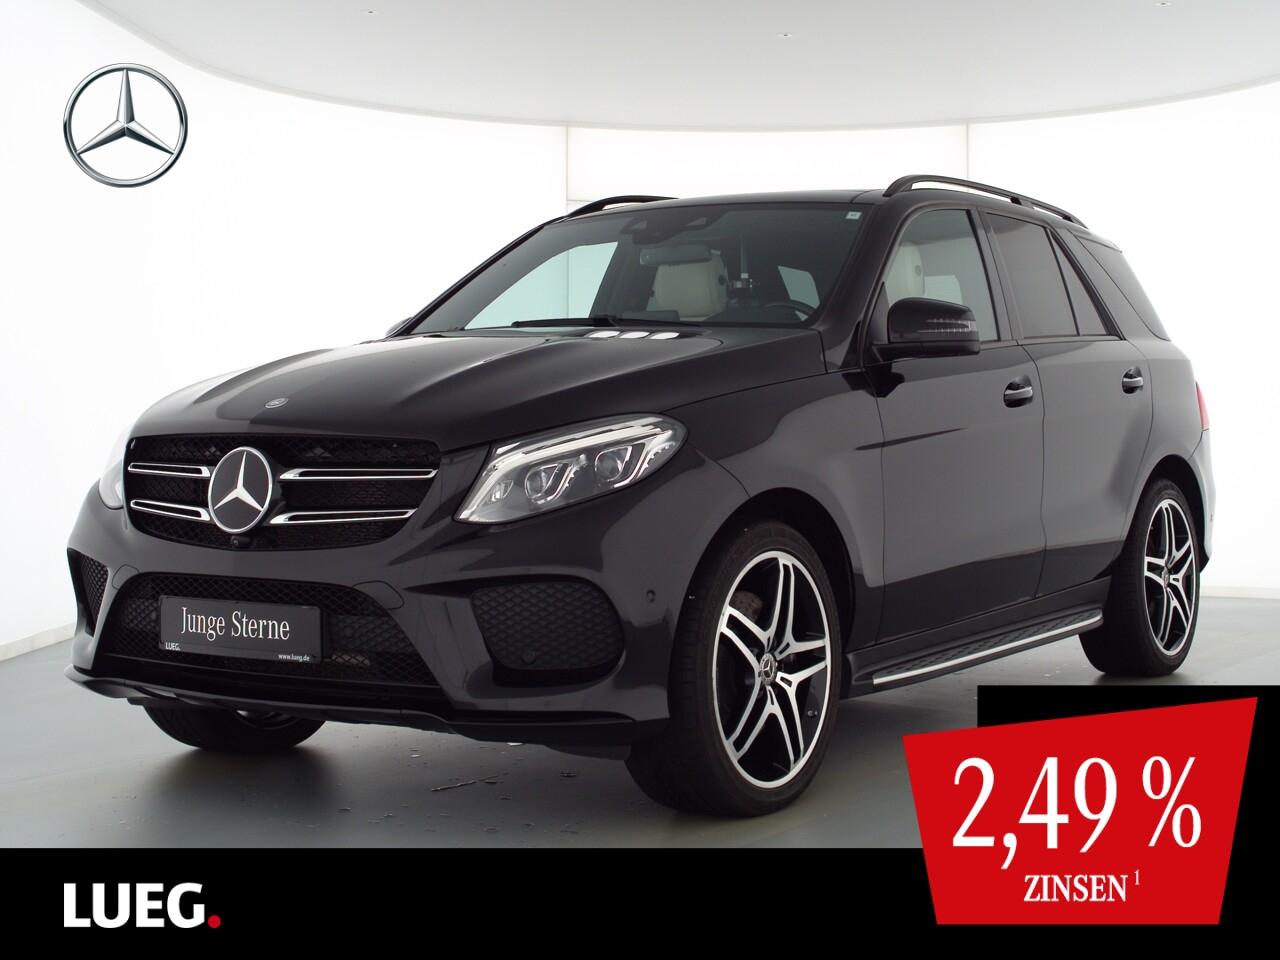 Mercedes-Benz GLE 500 4M AMG+COM+Pano+LED-ILS+B&O+21+Sthzg+360, Jahr 2017, Benzin